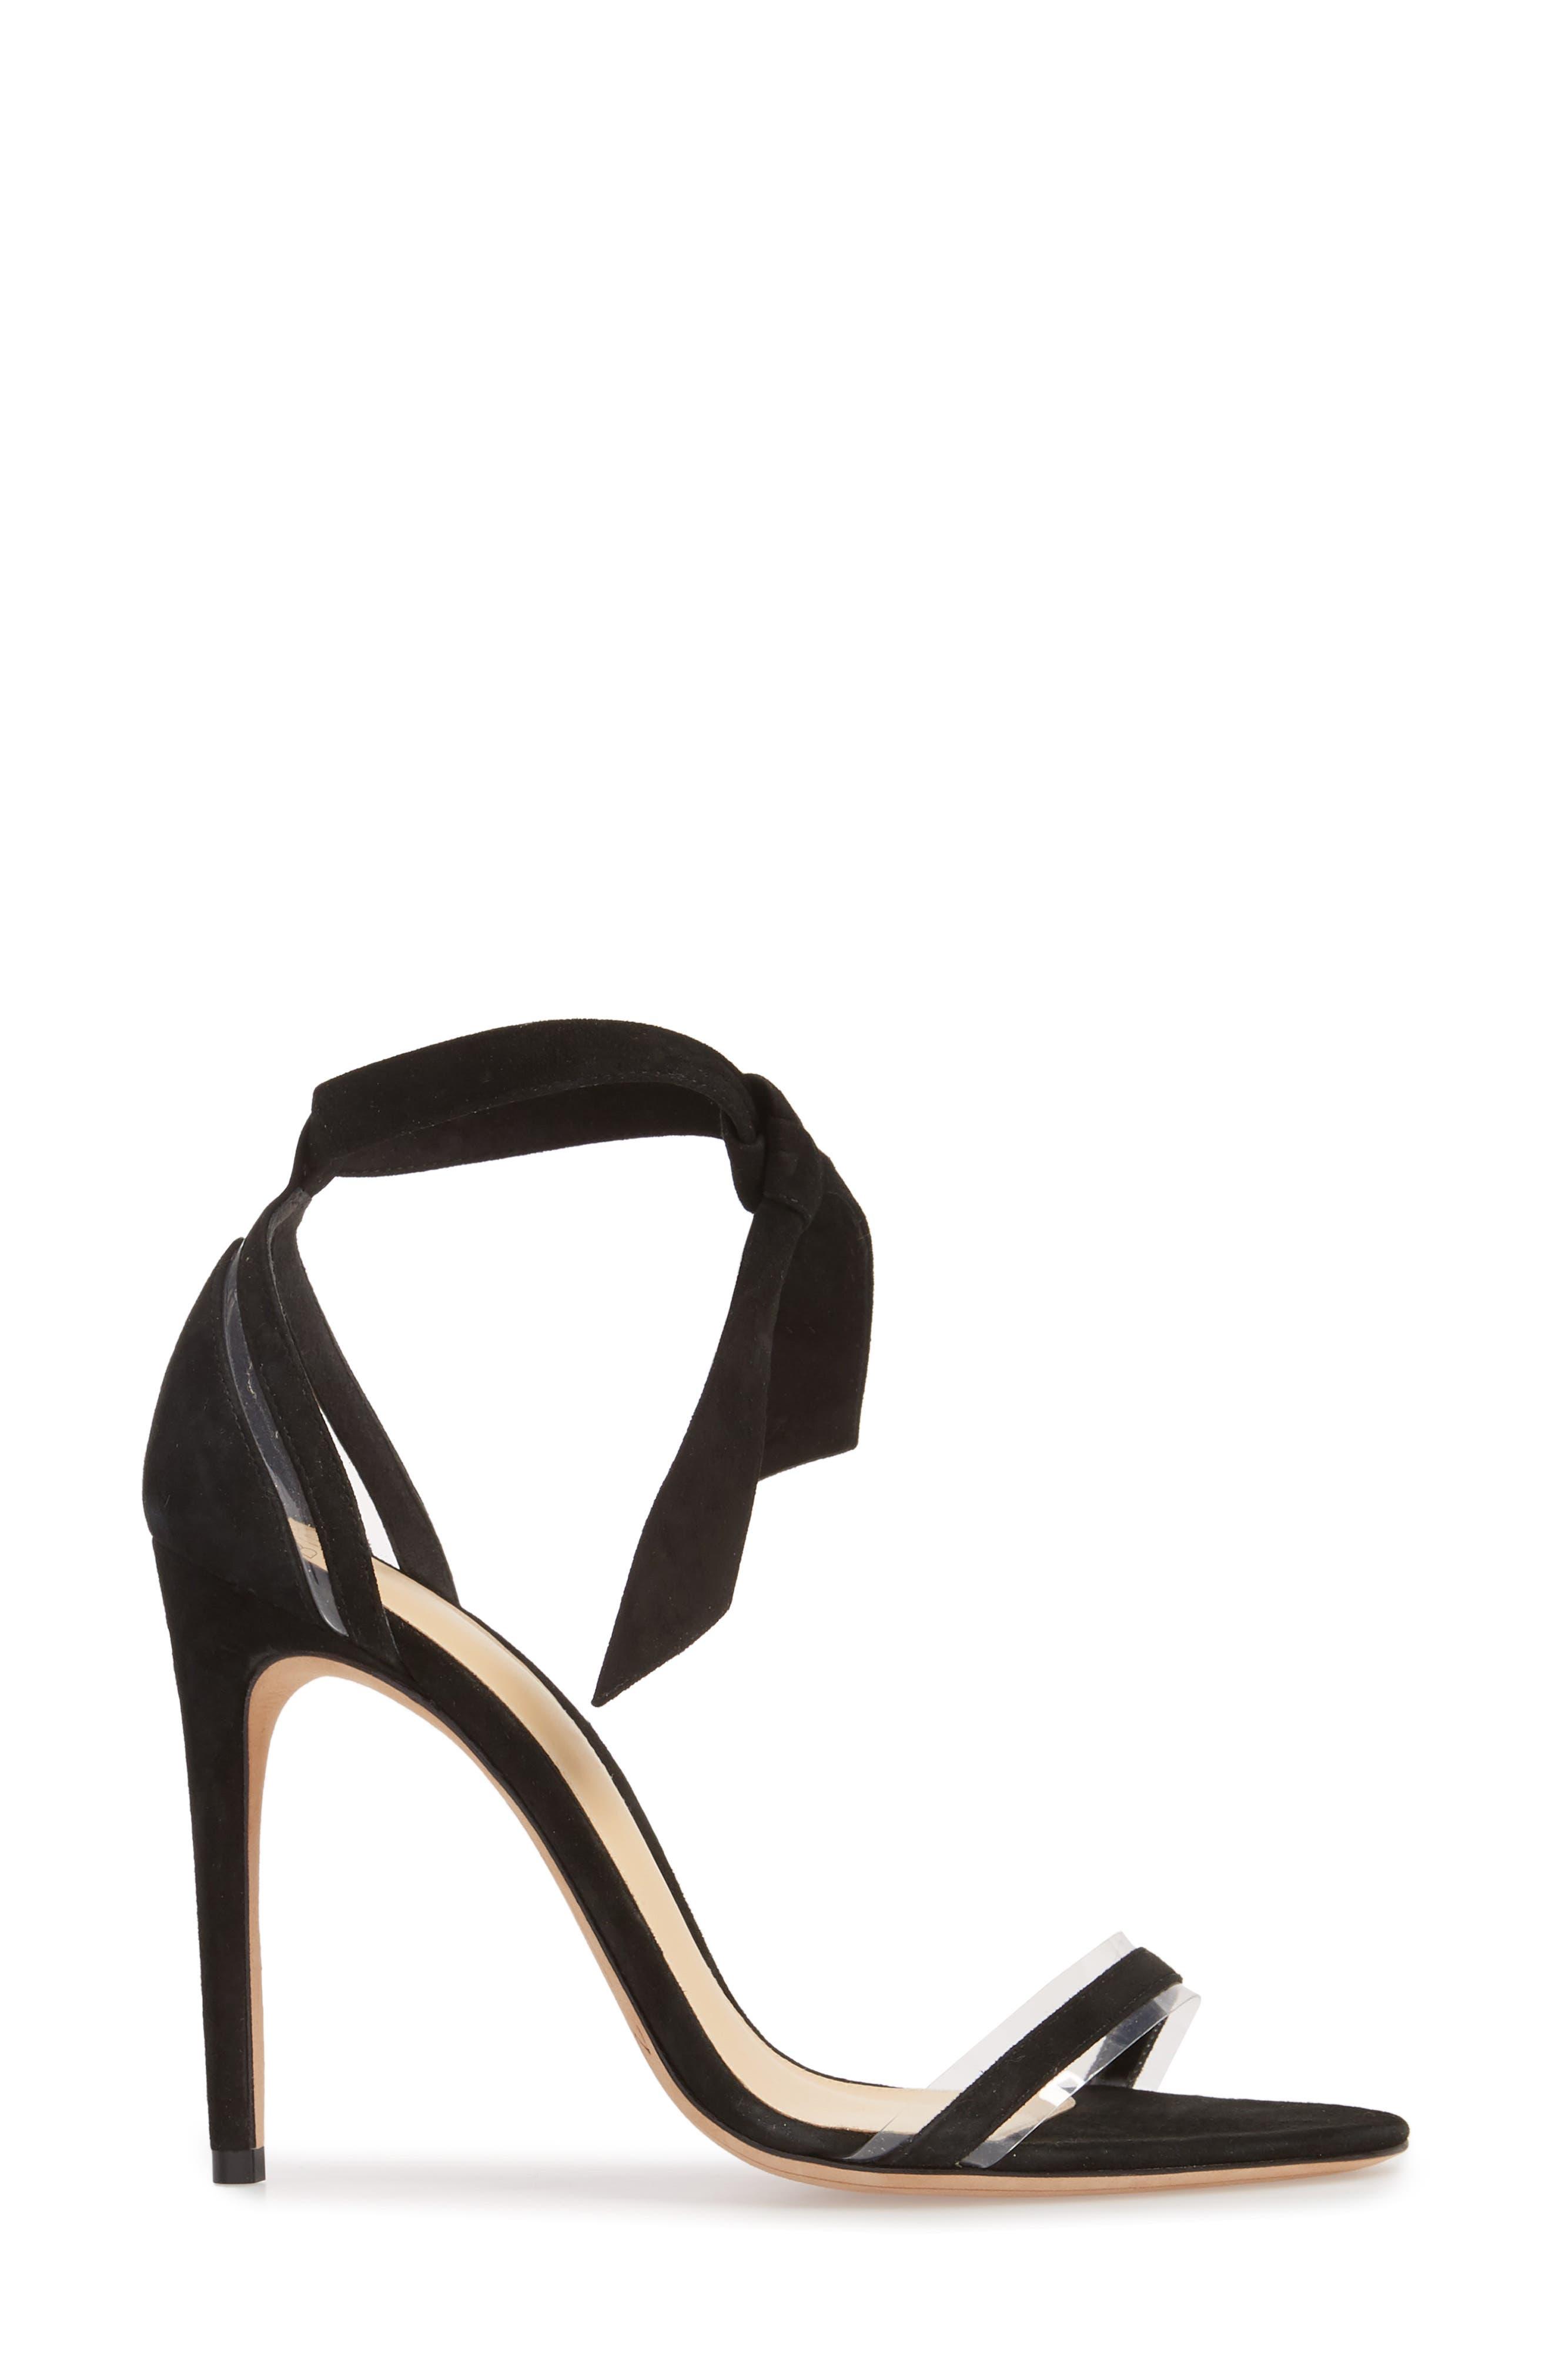 ALEXANDRE BIRMAN, Clarita Clear Ankle Tie Sandal, Alternate thumbnail 3, color, BLACK/ TRANSPARENT